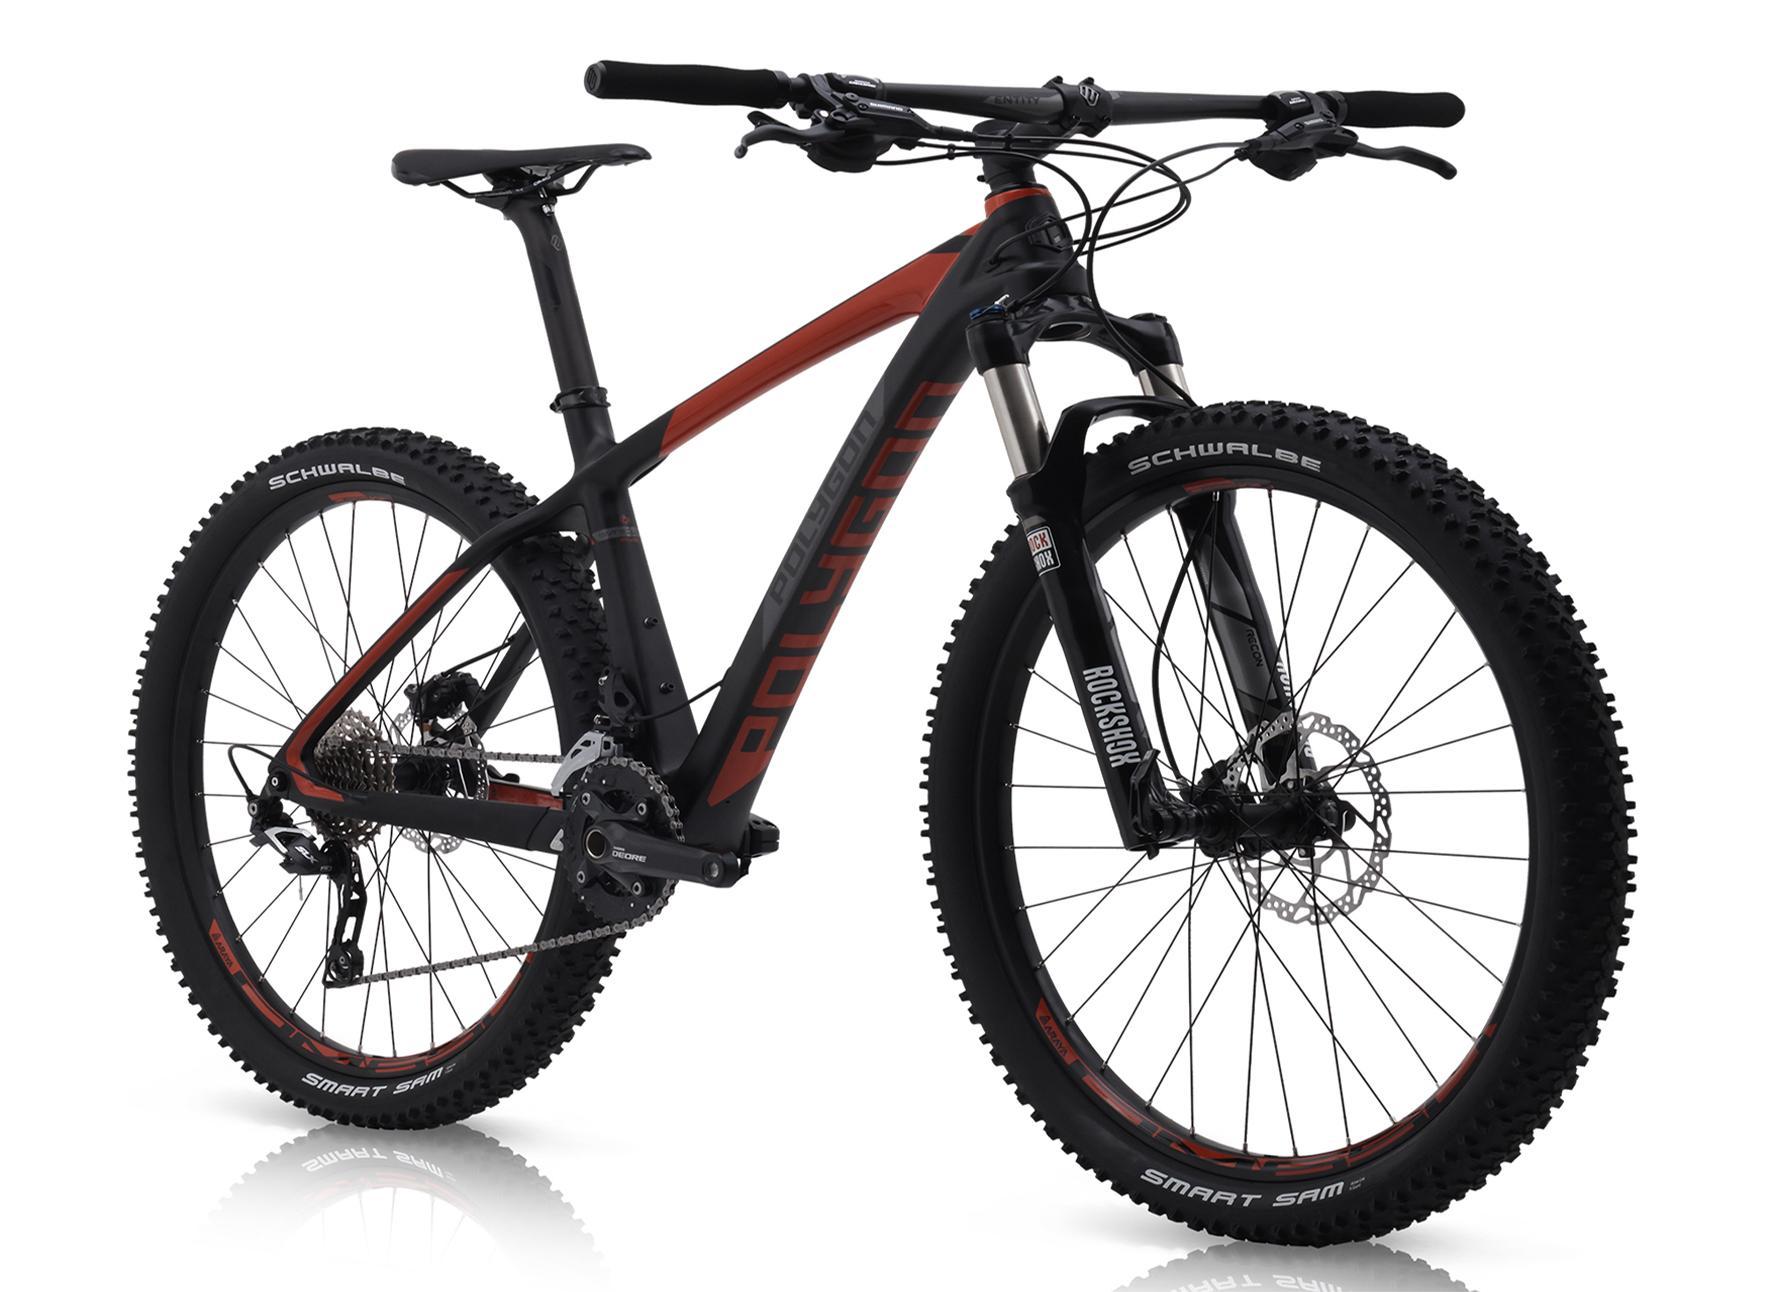 Polygon Syncline 5 XC Full Carbon Frame Mountain Bike